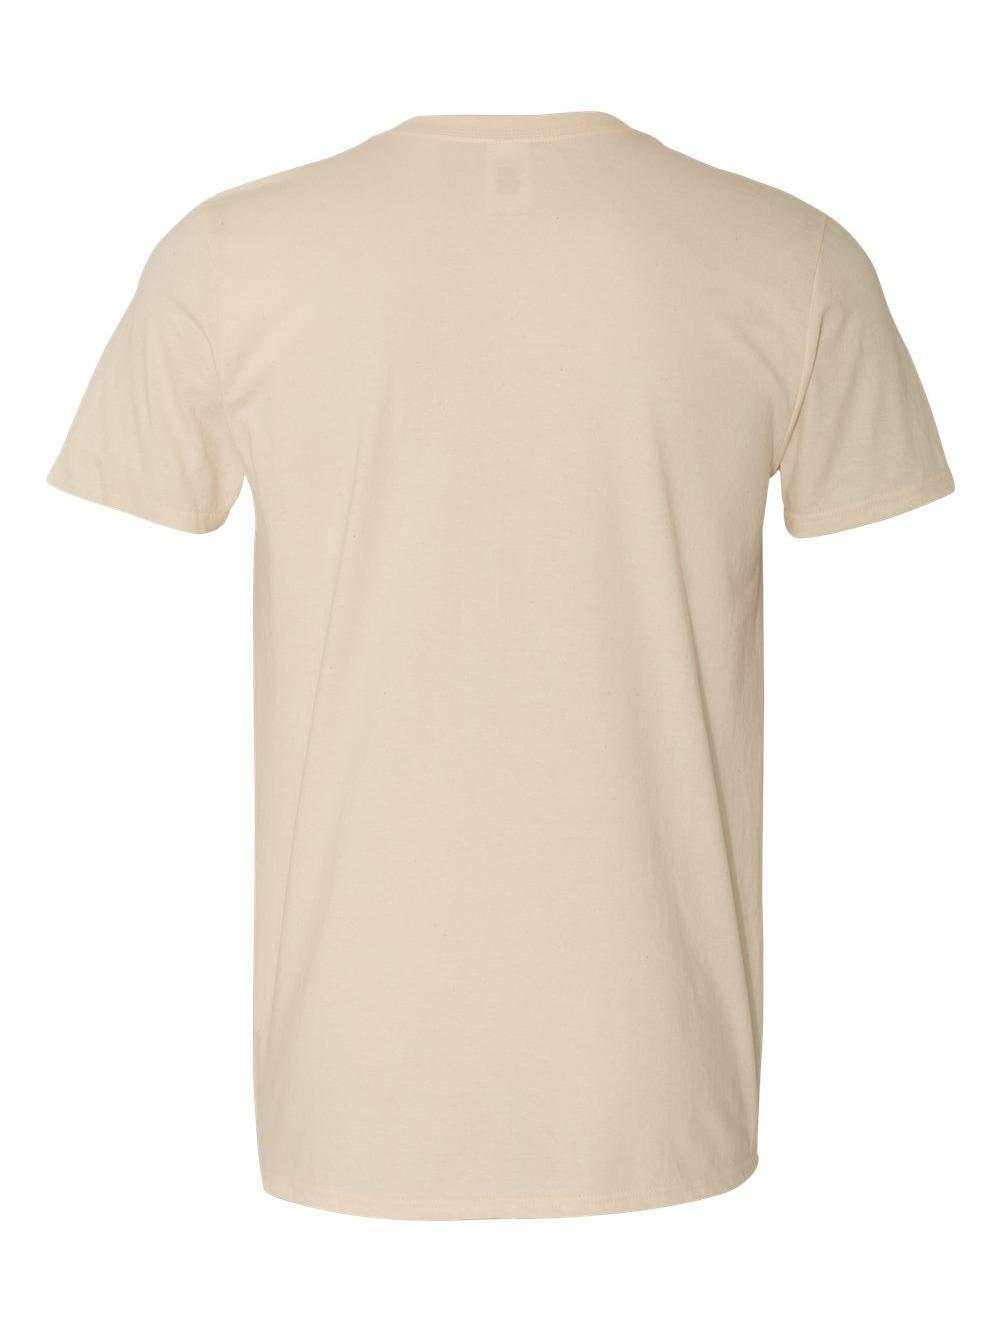 Gildan-Softstyle-T-Shirt-64000 thumbnail 139